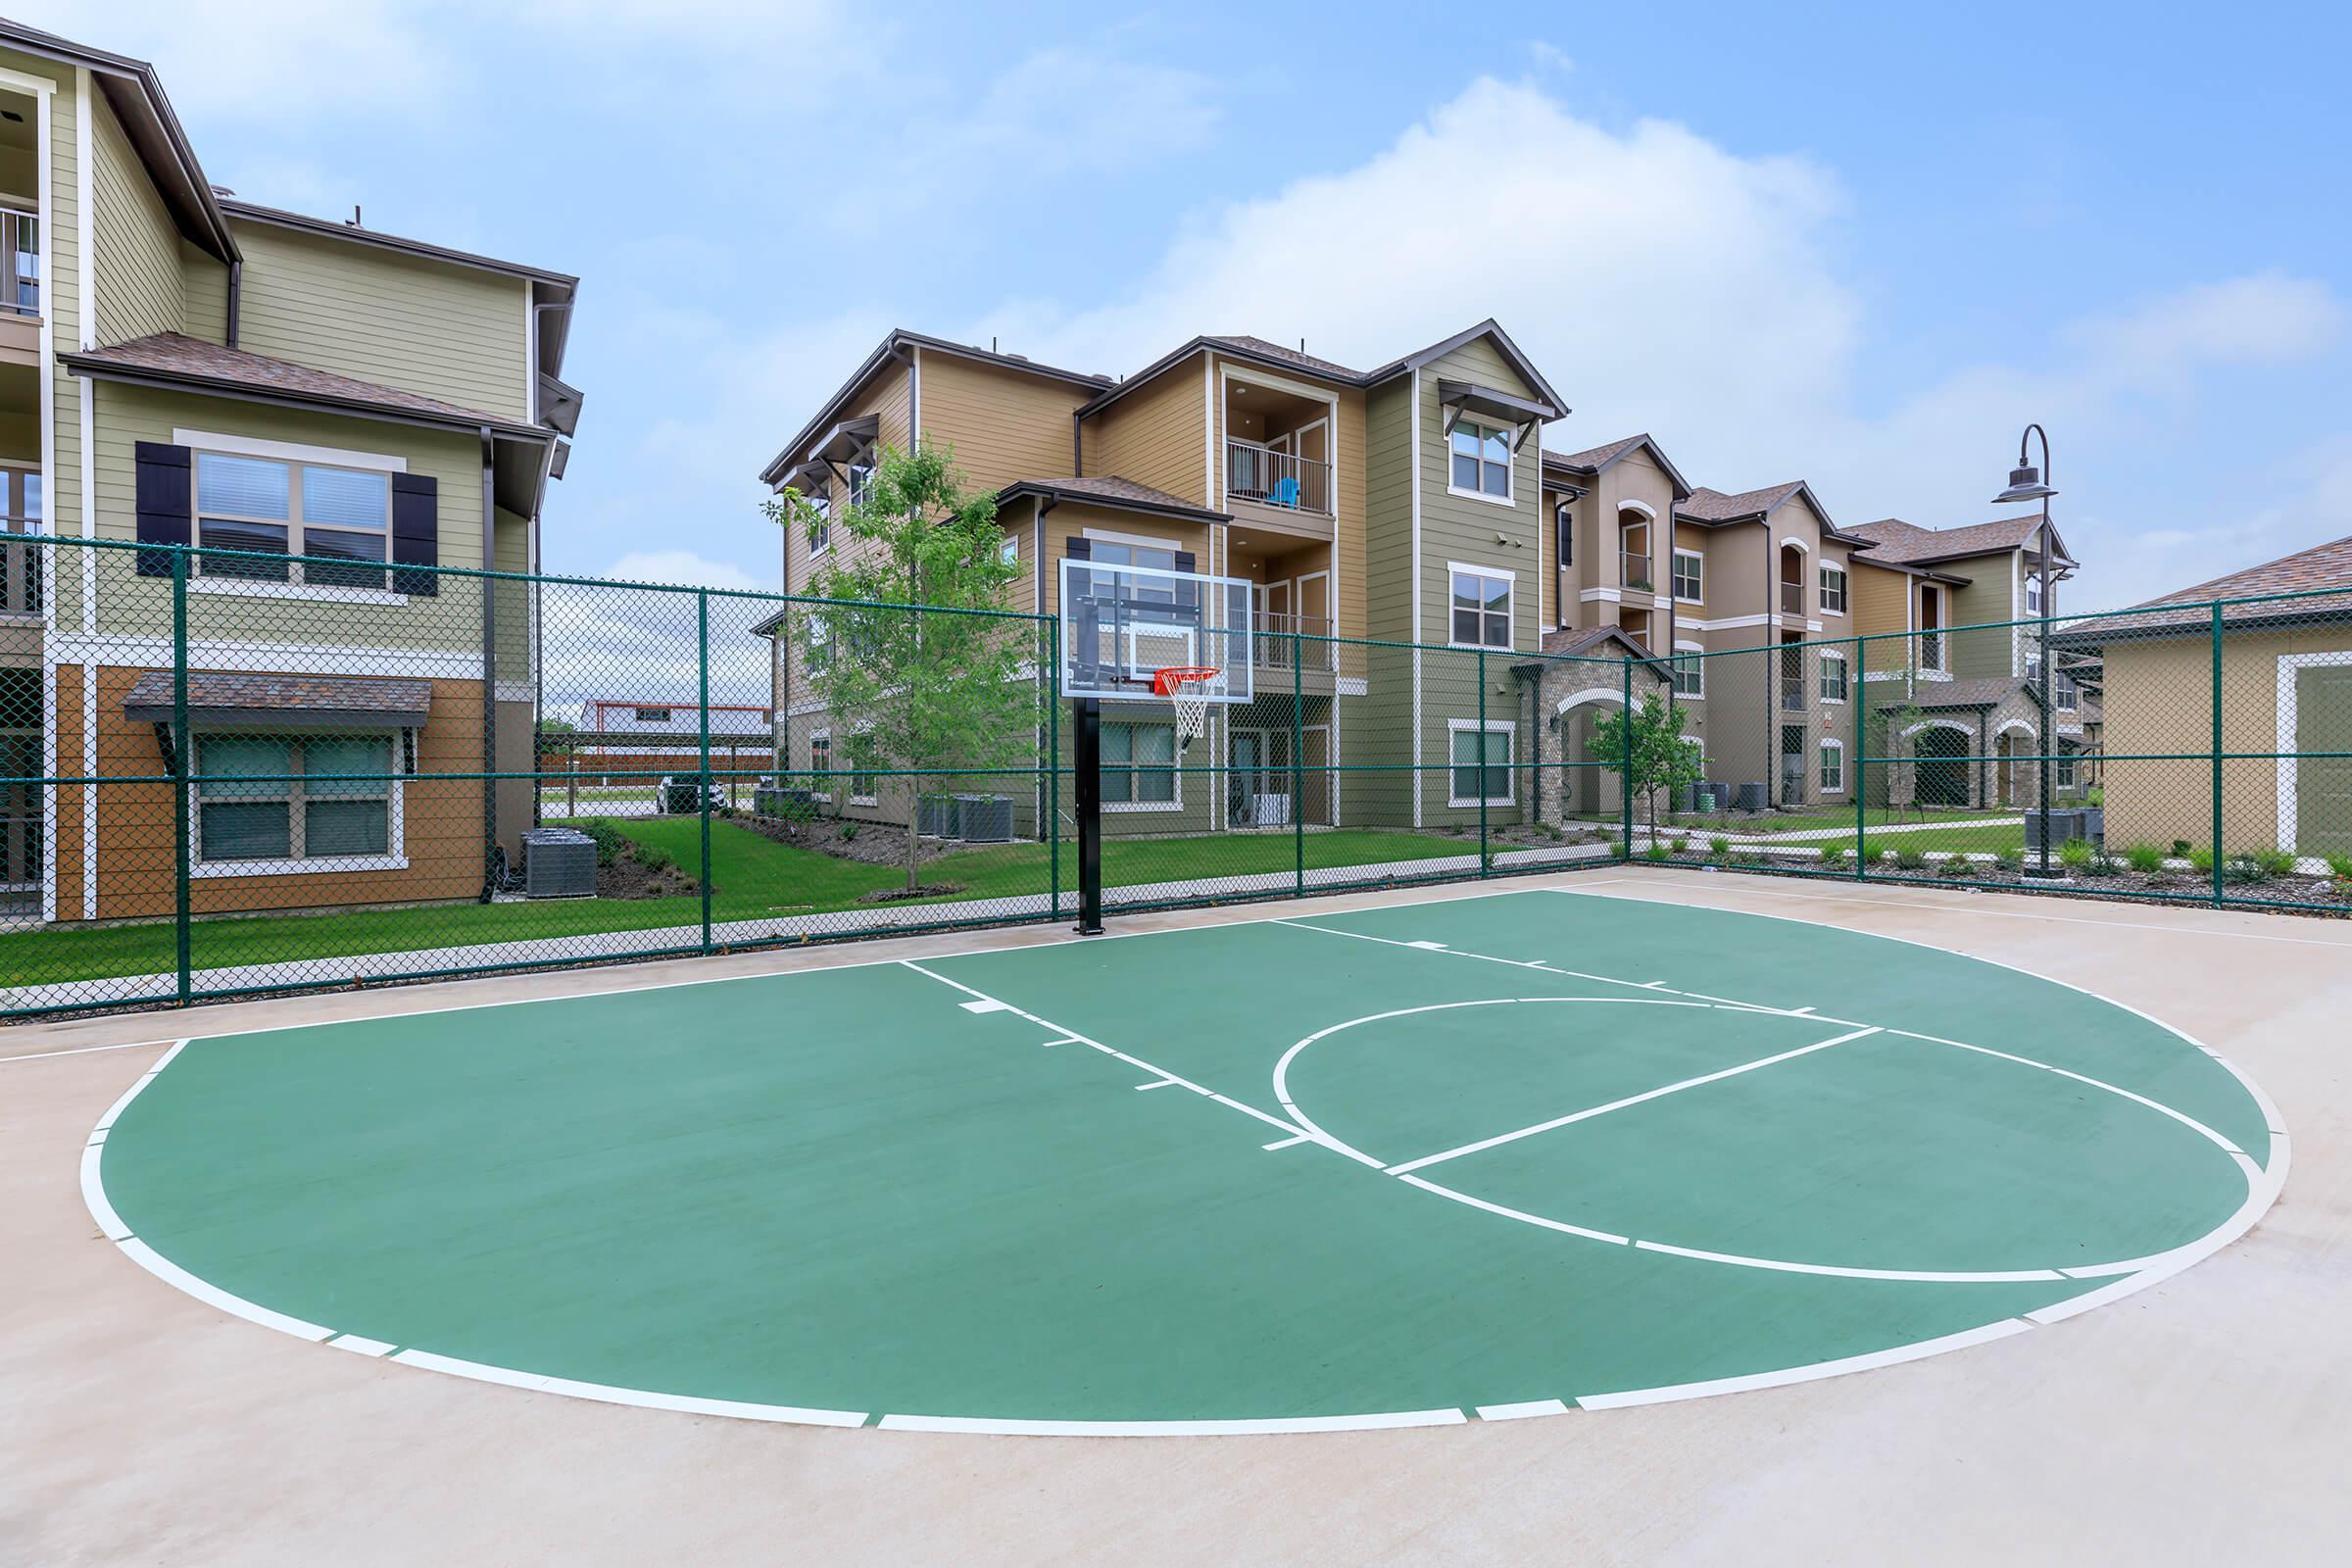 a house on a basketball court